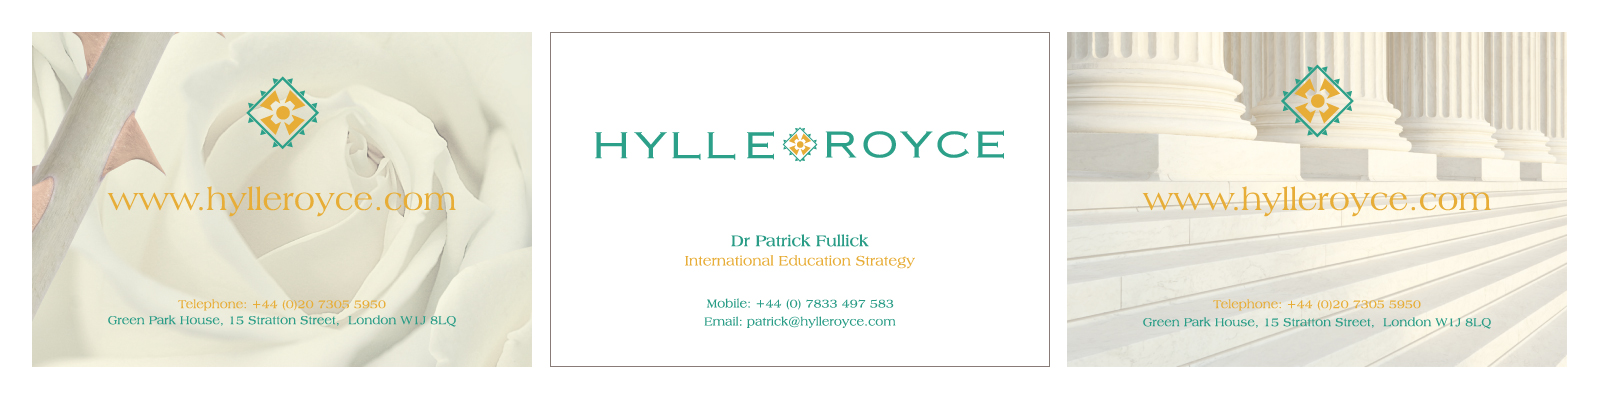 hylleroyce_bus_card